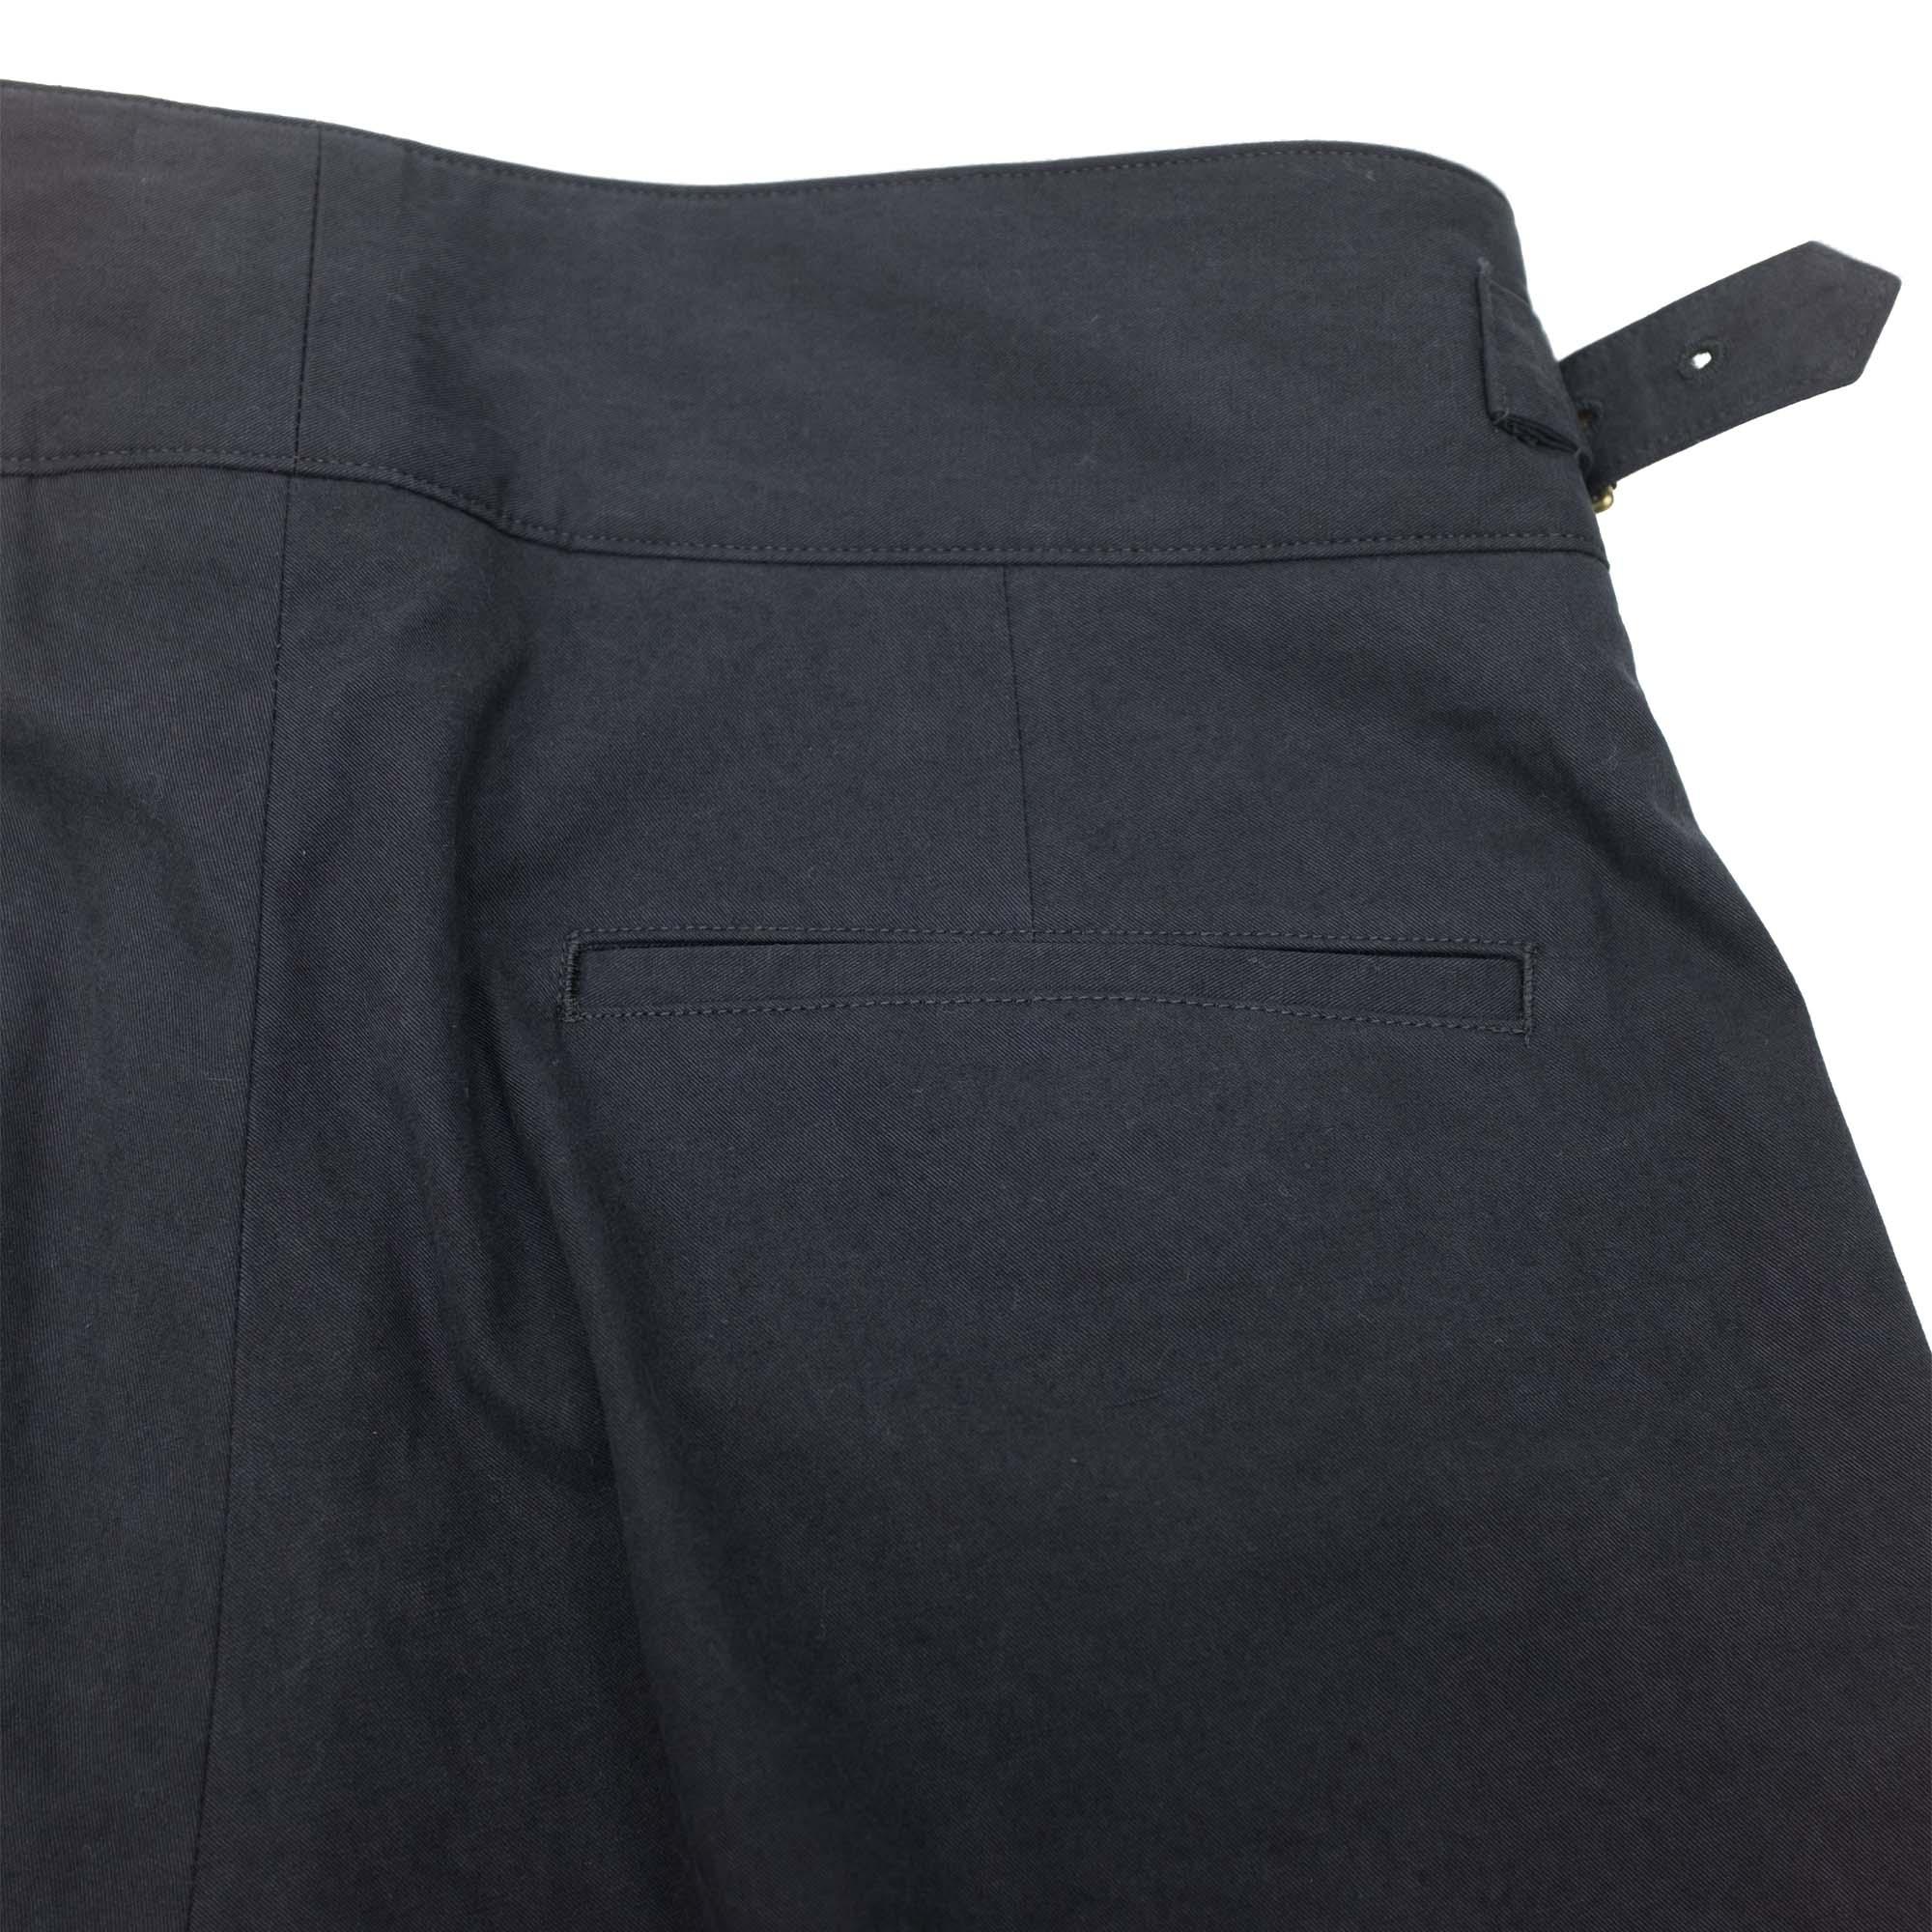 Kuro Sulfur Dyed NIDOM Gurkha Pants - Black